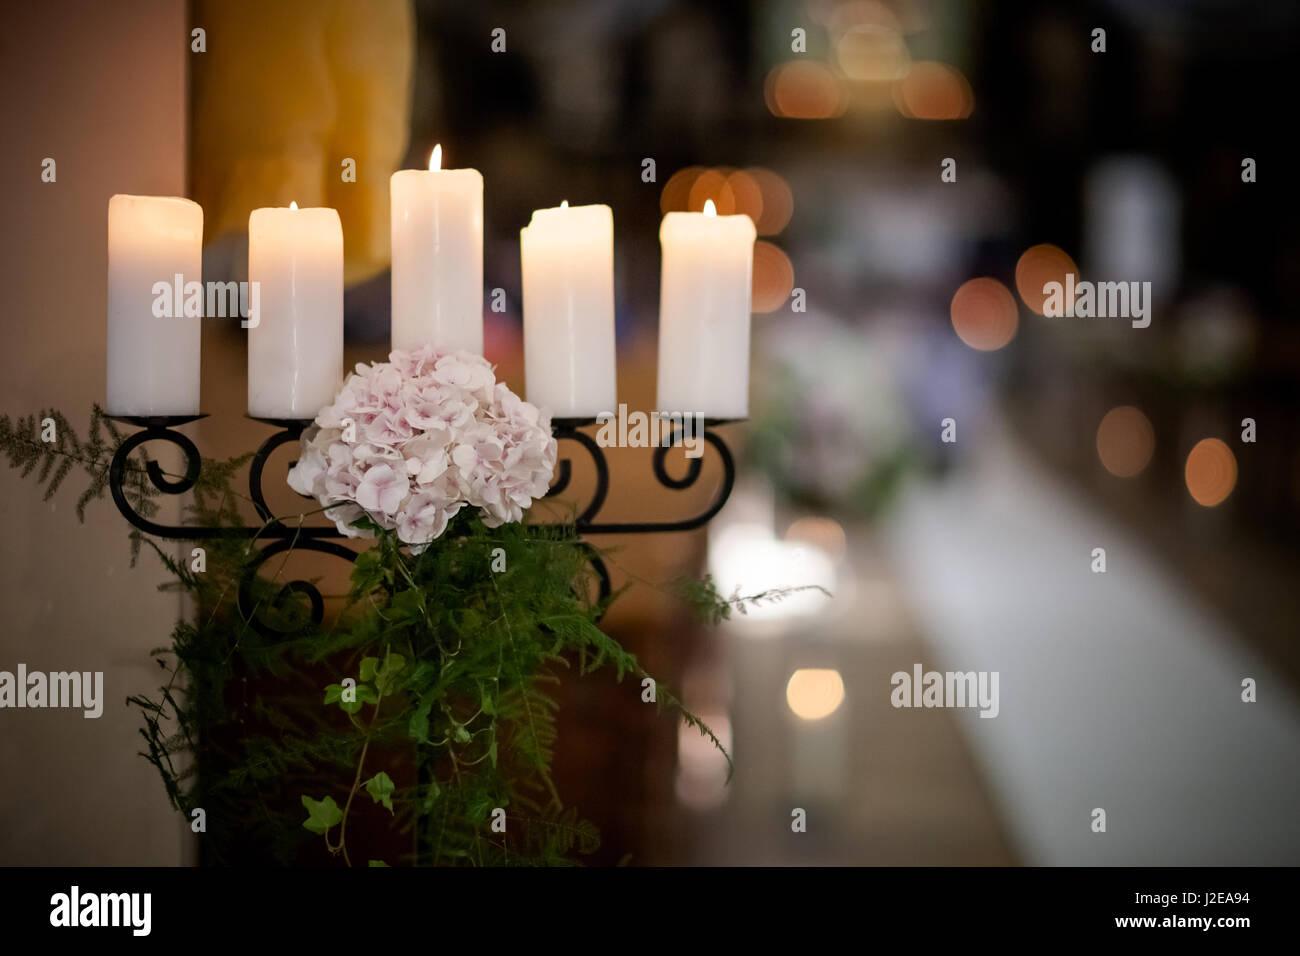 Hochzeit Blumen Kirche Hochzeitsfloristik Bei Altstadt Floristik